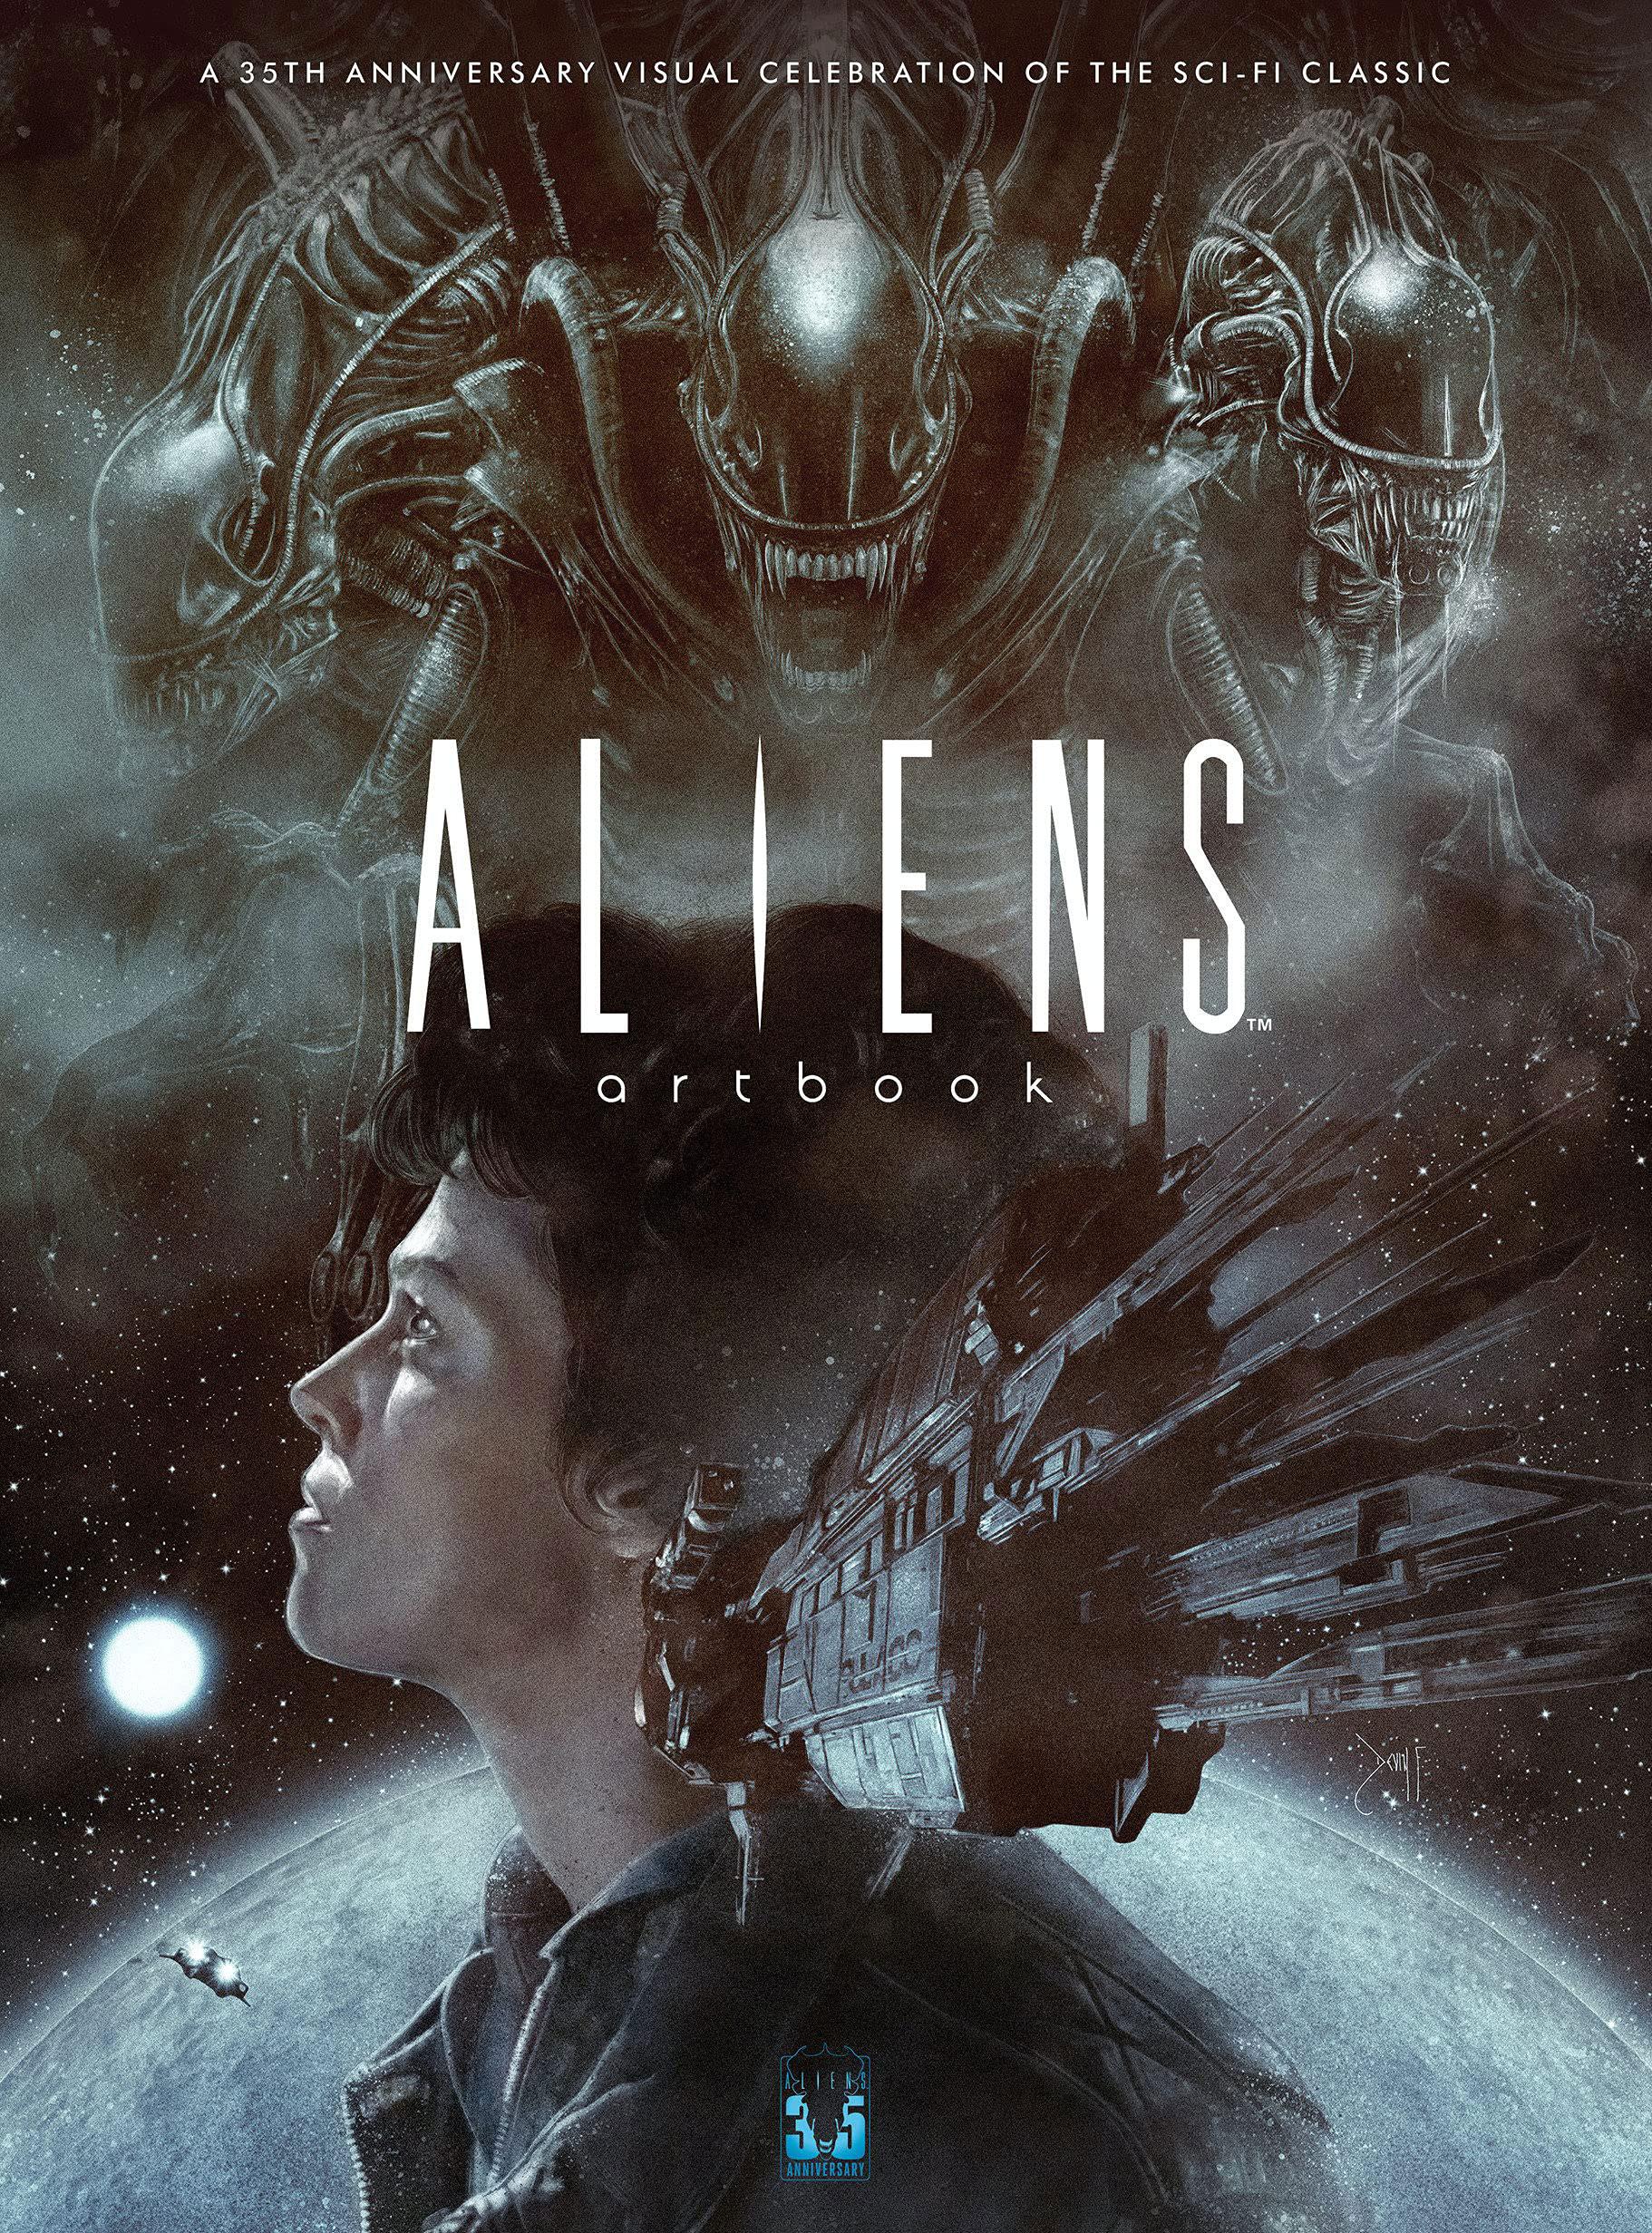 Aliens - Artbook from Titan Books